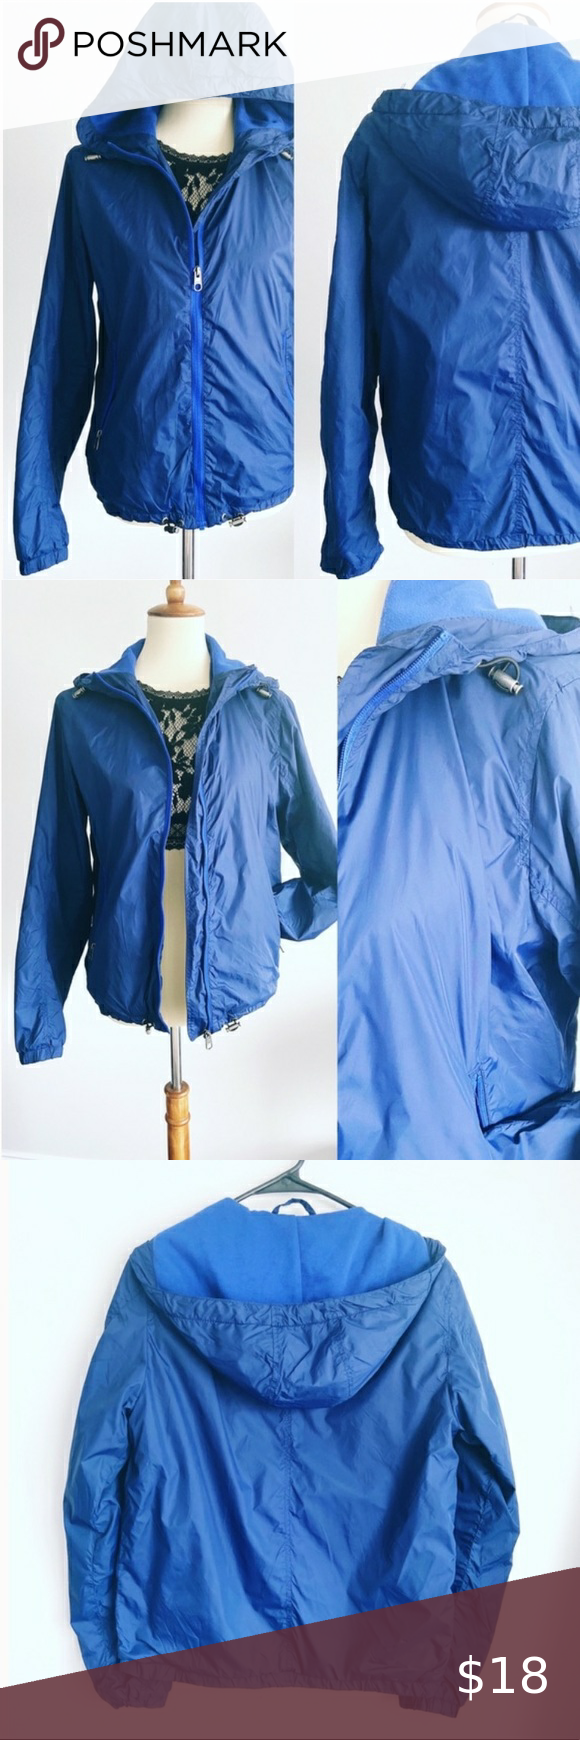 H M L O G G Full Zip Waterproof Rain Jacket Cobalt Blue Rain Jacket From H M L O G G Brand Is Waterproof P Waterproof Rain Jacket Blue Rain Jacket Rain Jacket